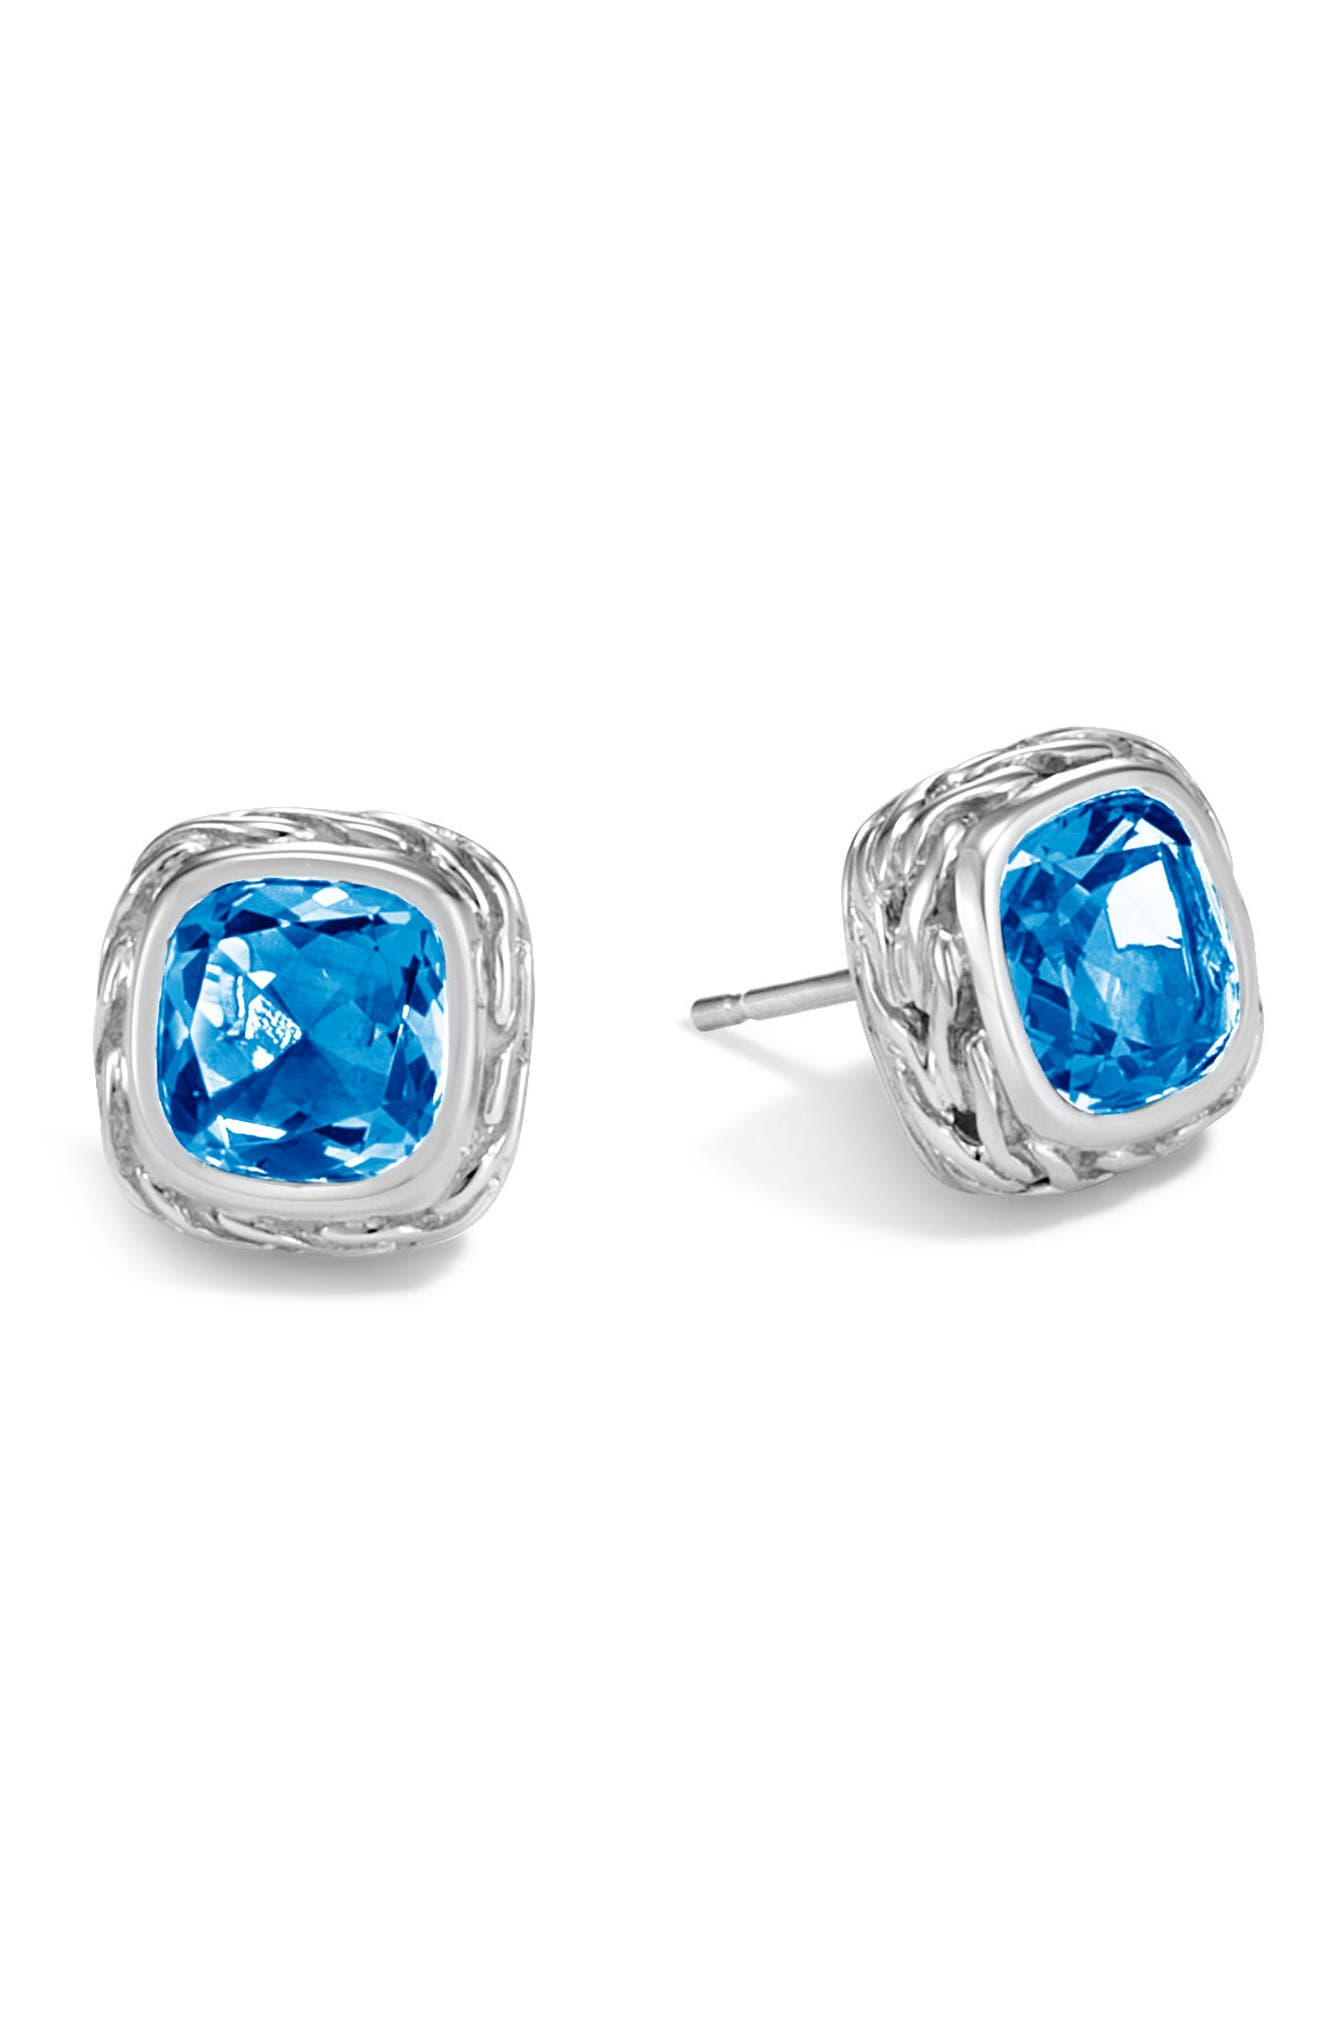 Magic Cut Blue Topaz Stud Earrings,                         Main,                         color, Silver/ London Blue Topaz